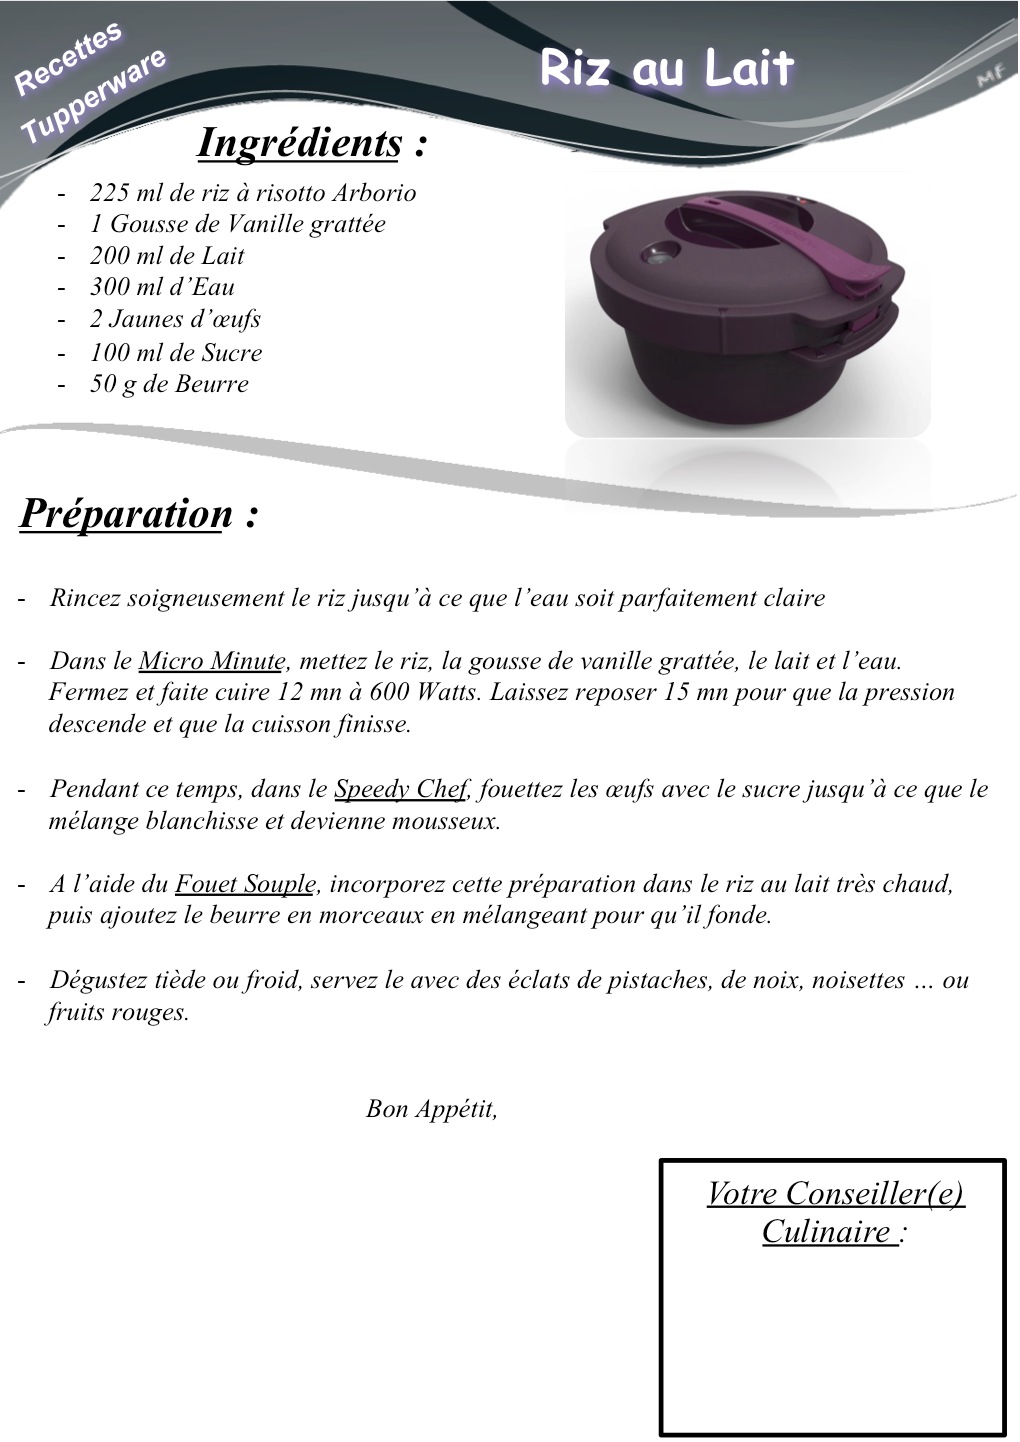 pingl par s verine g rard sur recette tupperware. Black Bedroom Furniture Sets. Home Design Ideas